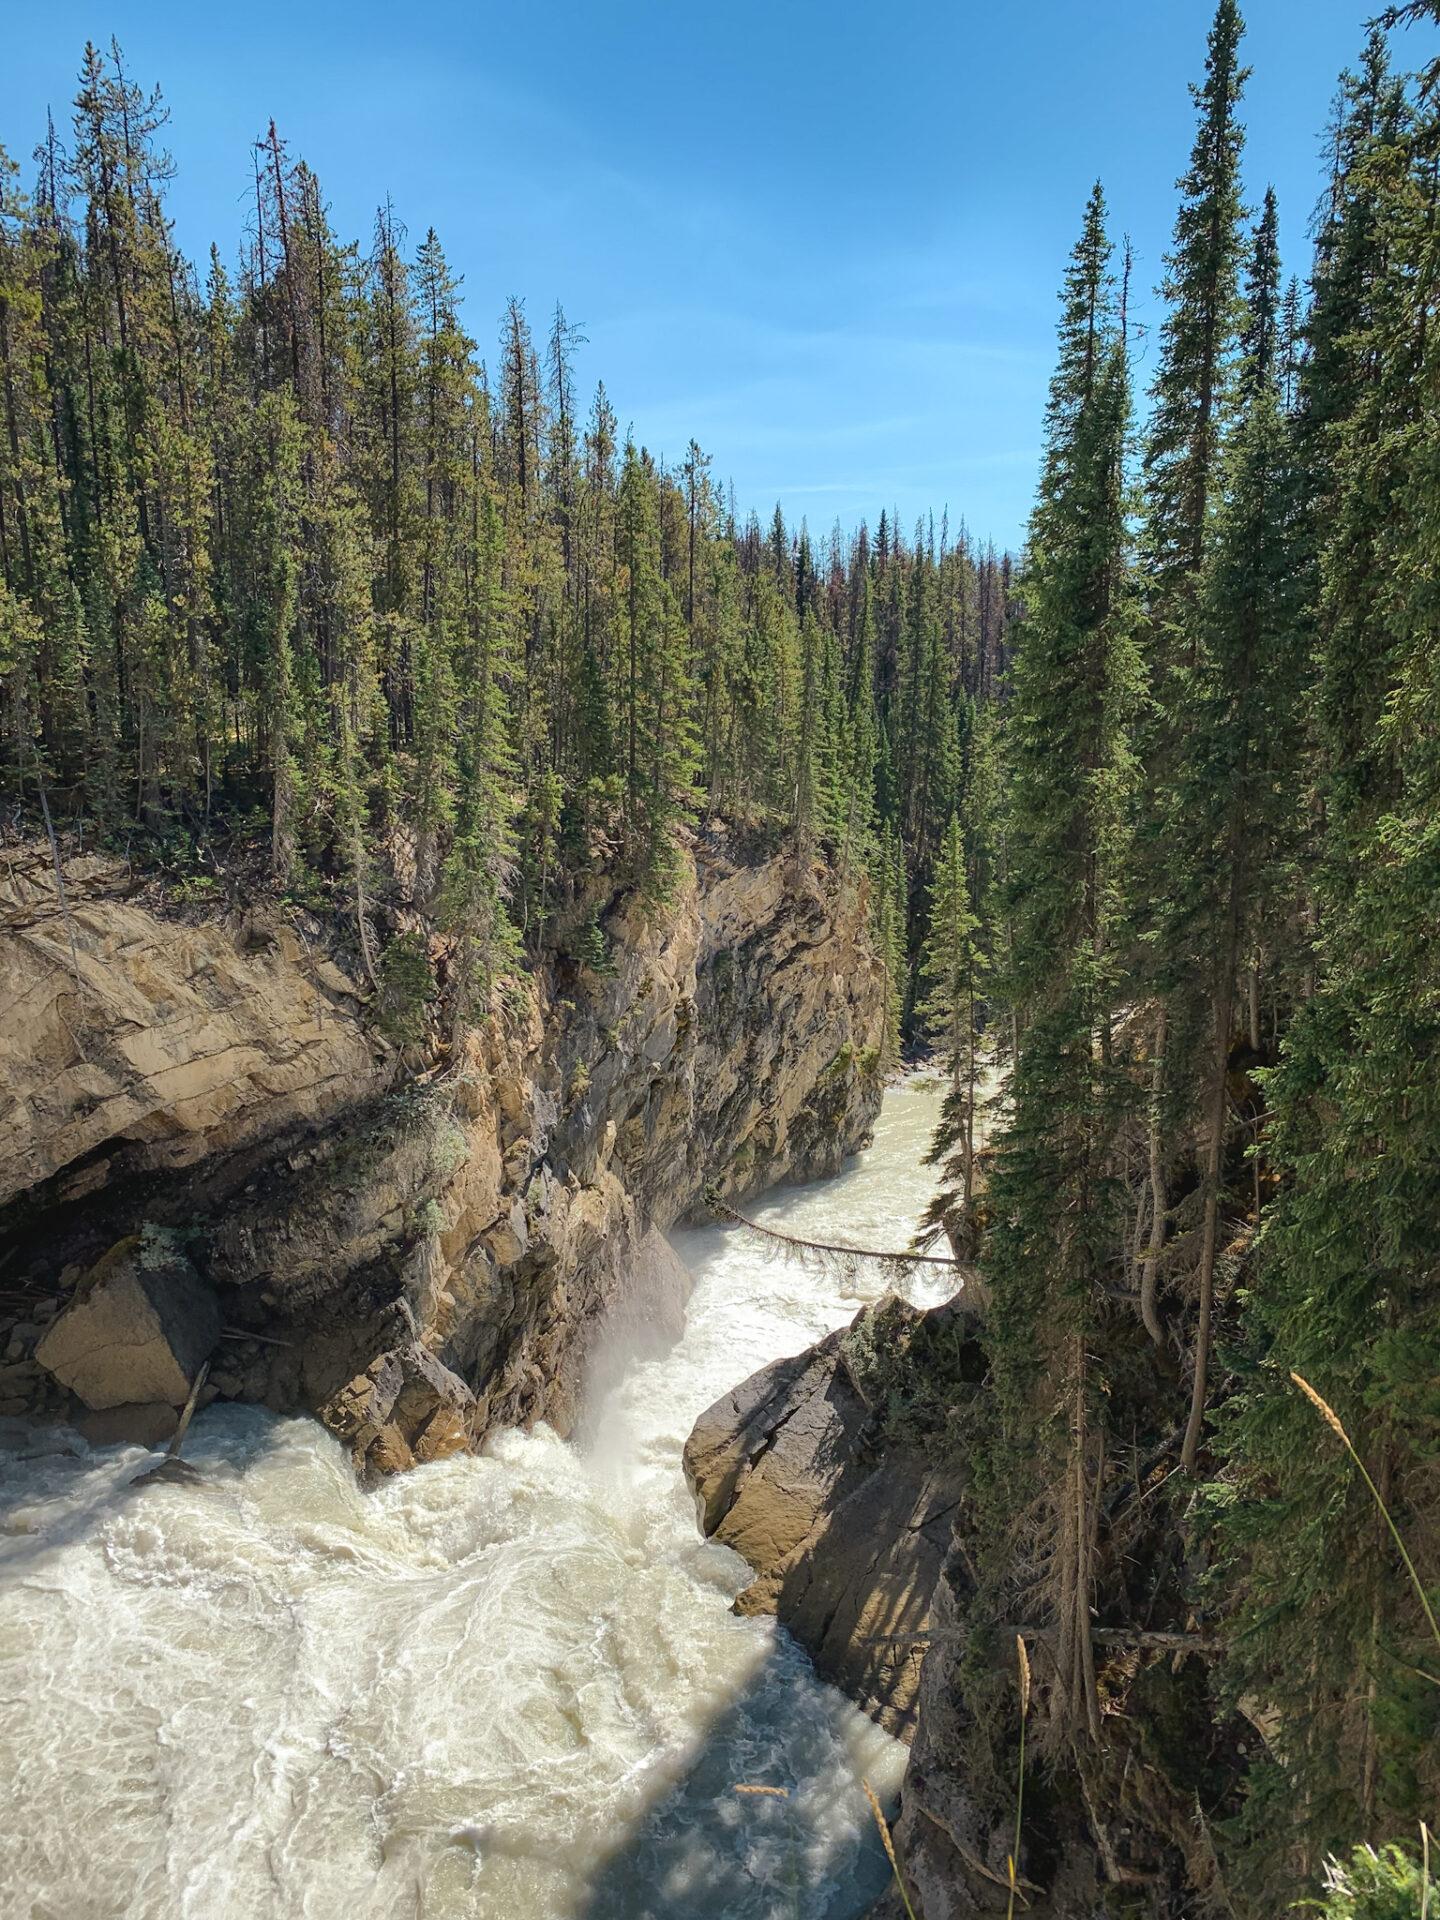 Sunwapta Falls in Jasper National Park, Alberta